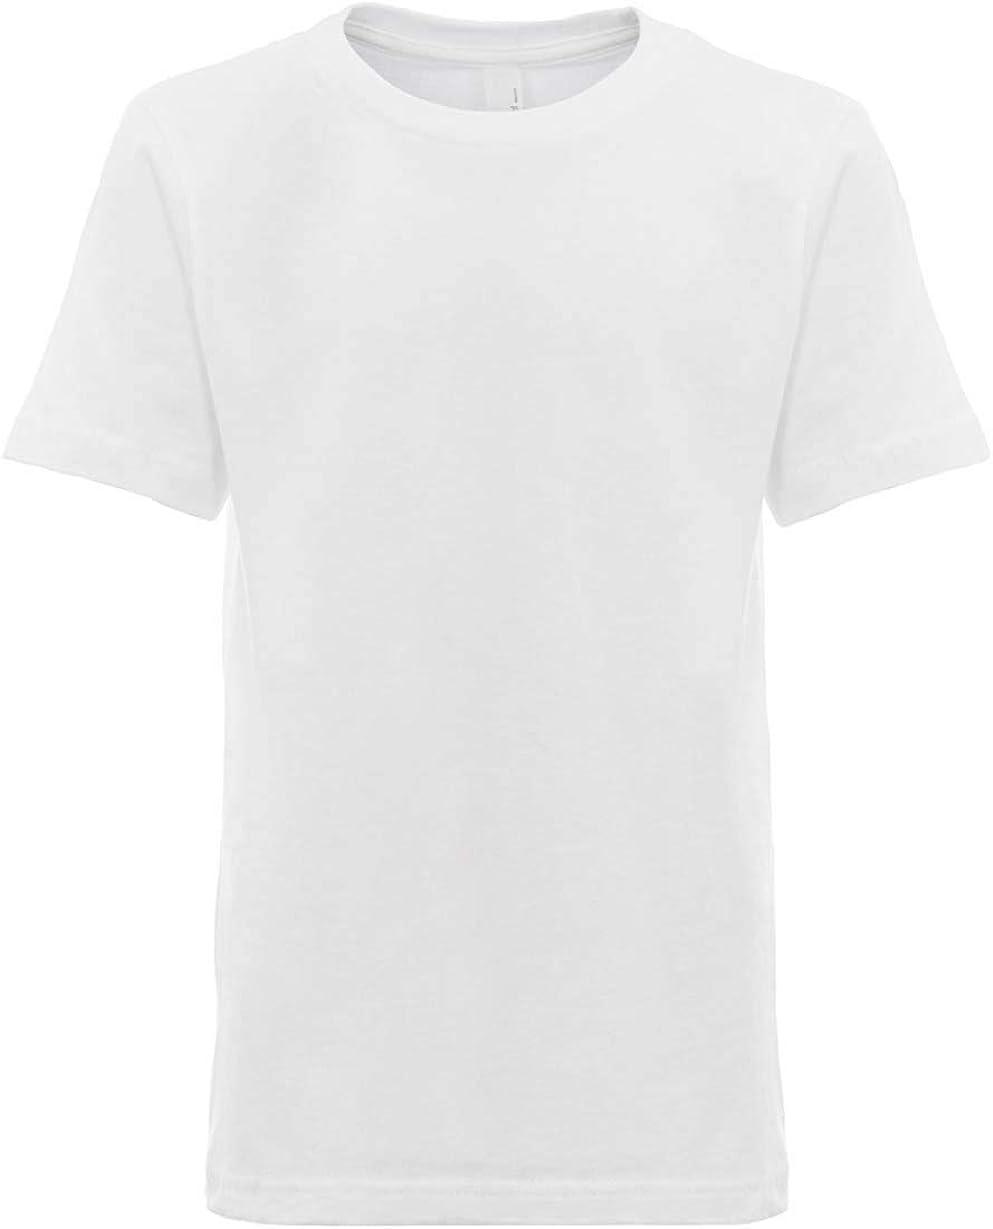 Next Level Kids Crew Neck T-Shirt White XS